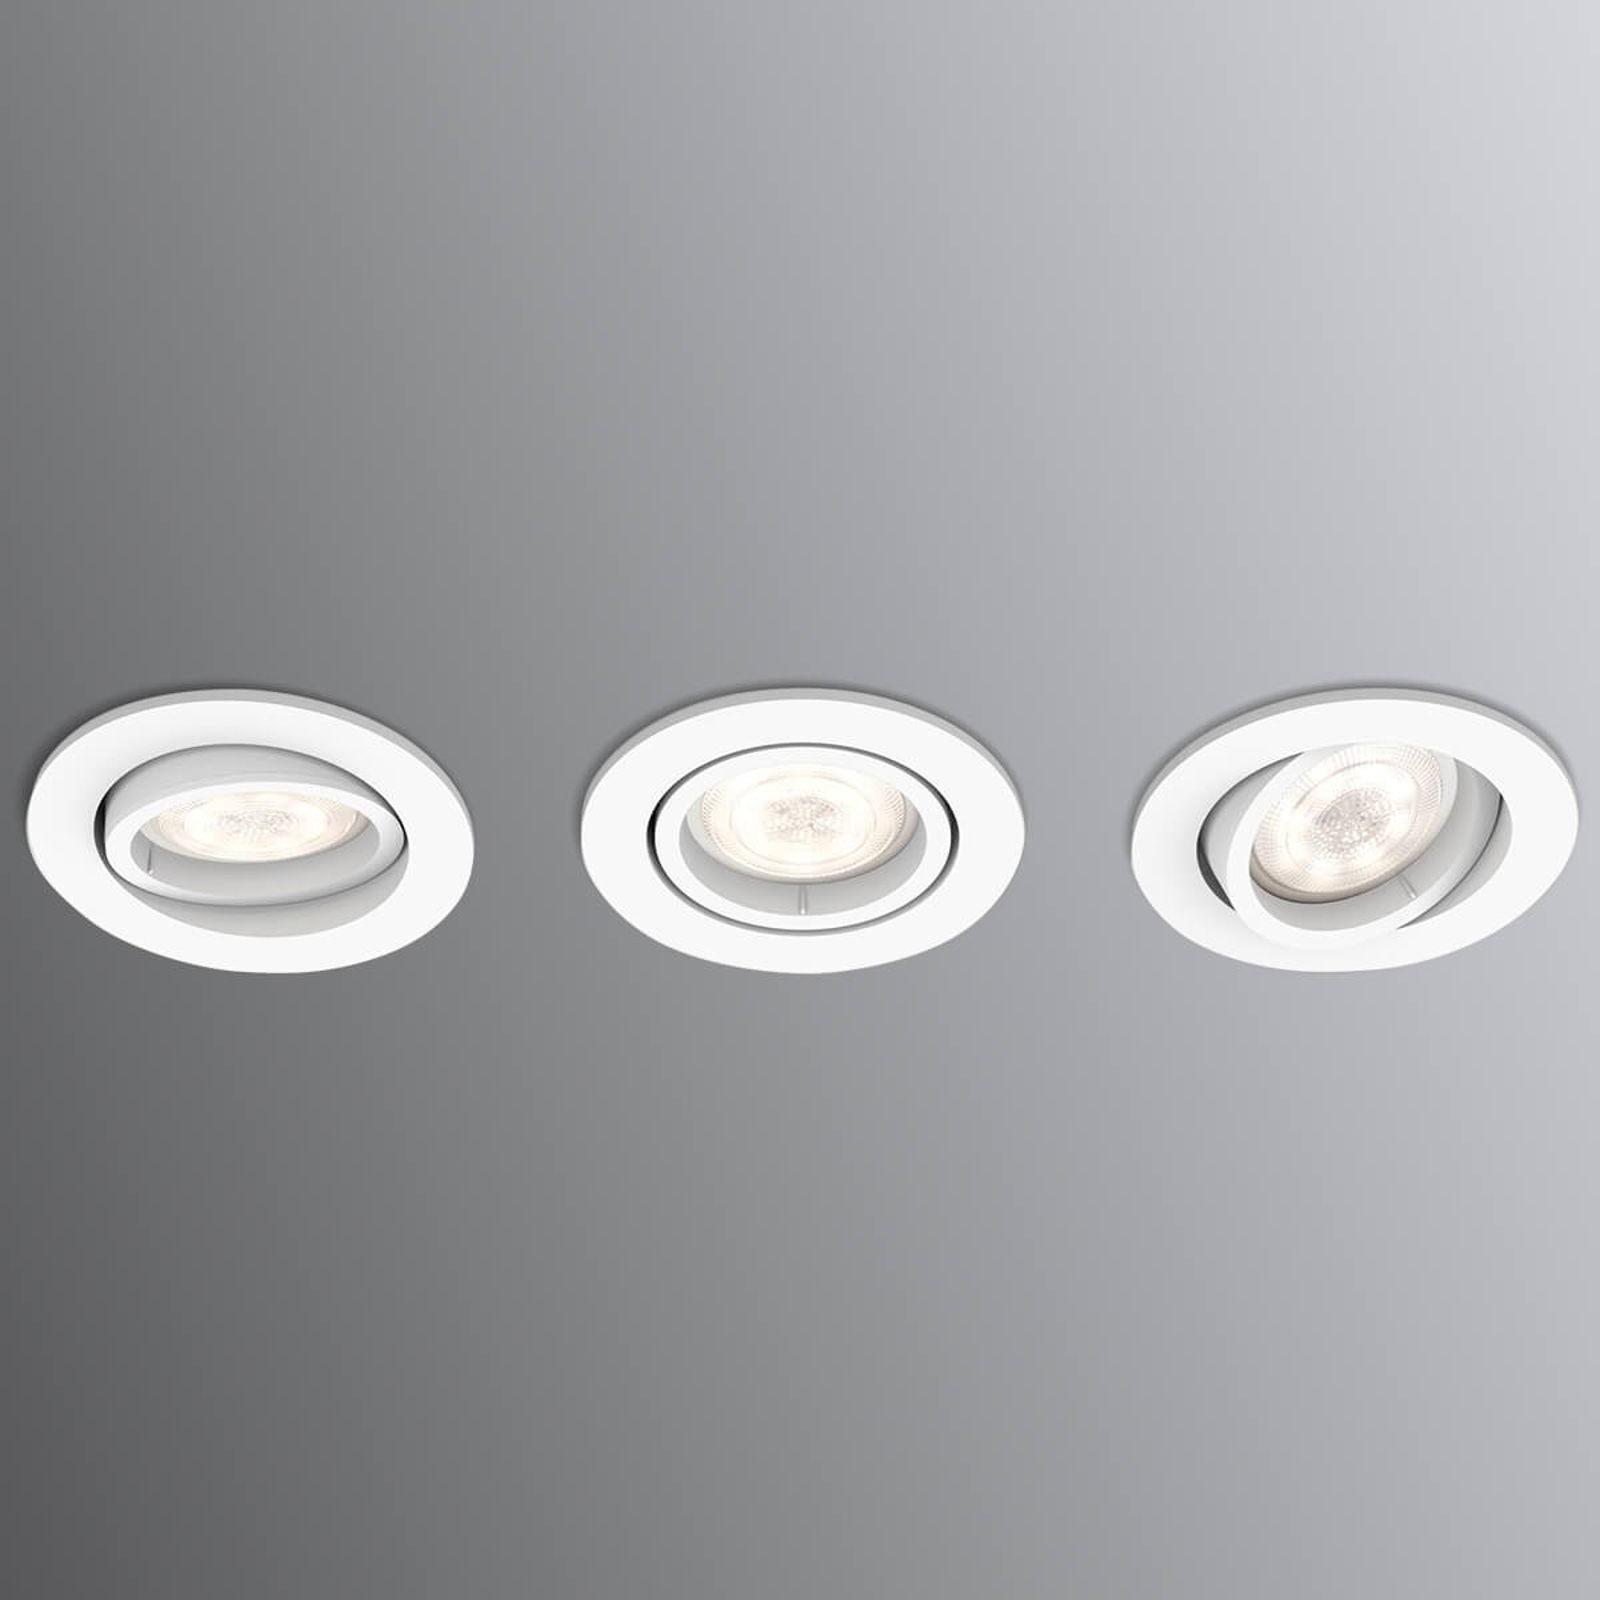 LED indbygningsspot Shellbark WarmGlow 3'er